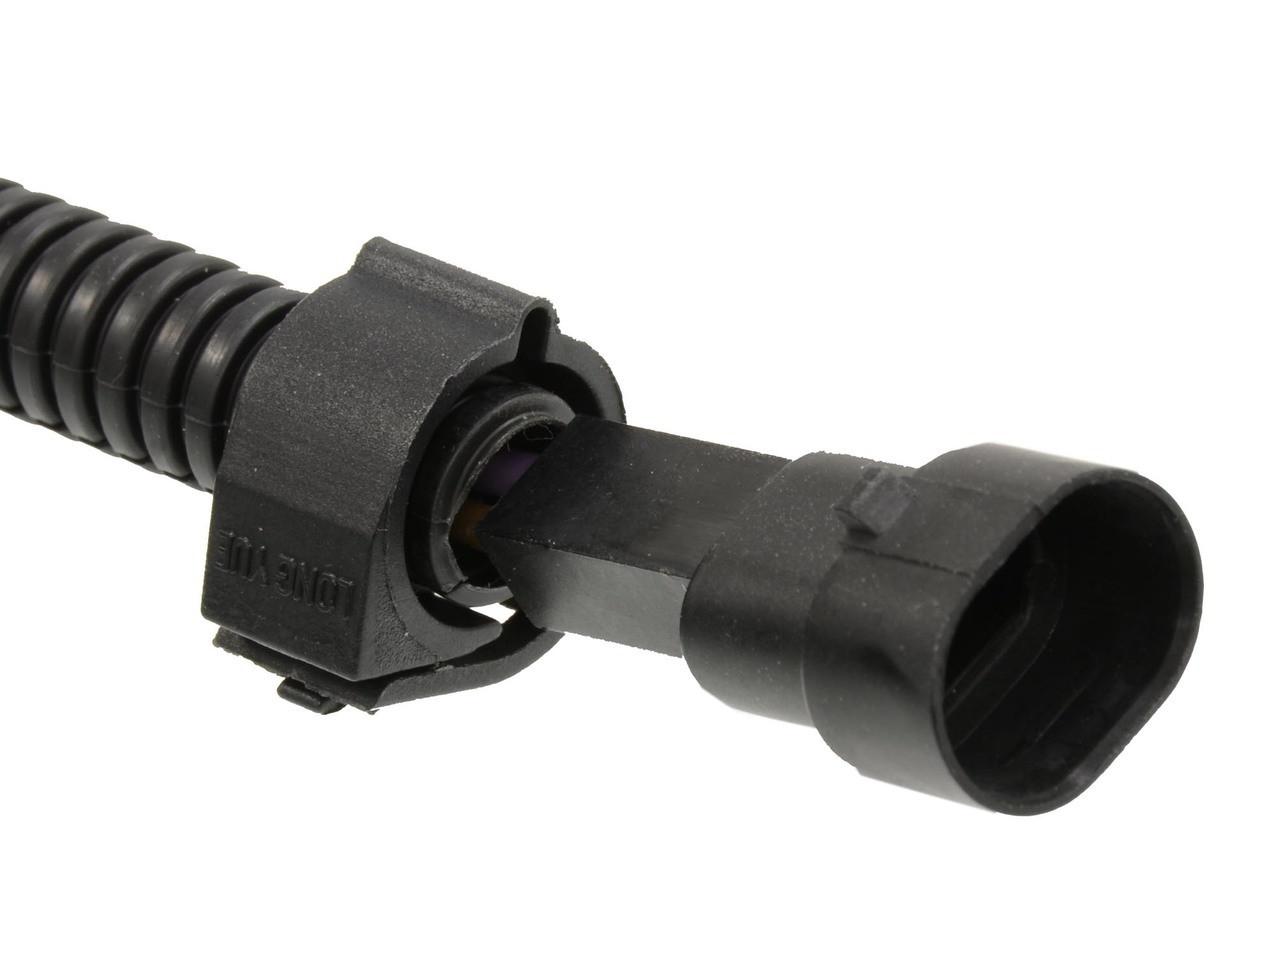 medium resolution of intake air temp iat mat sensor wire harness extension 22 fits gm ls1 lt1